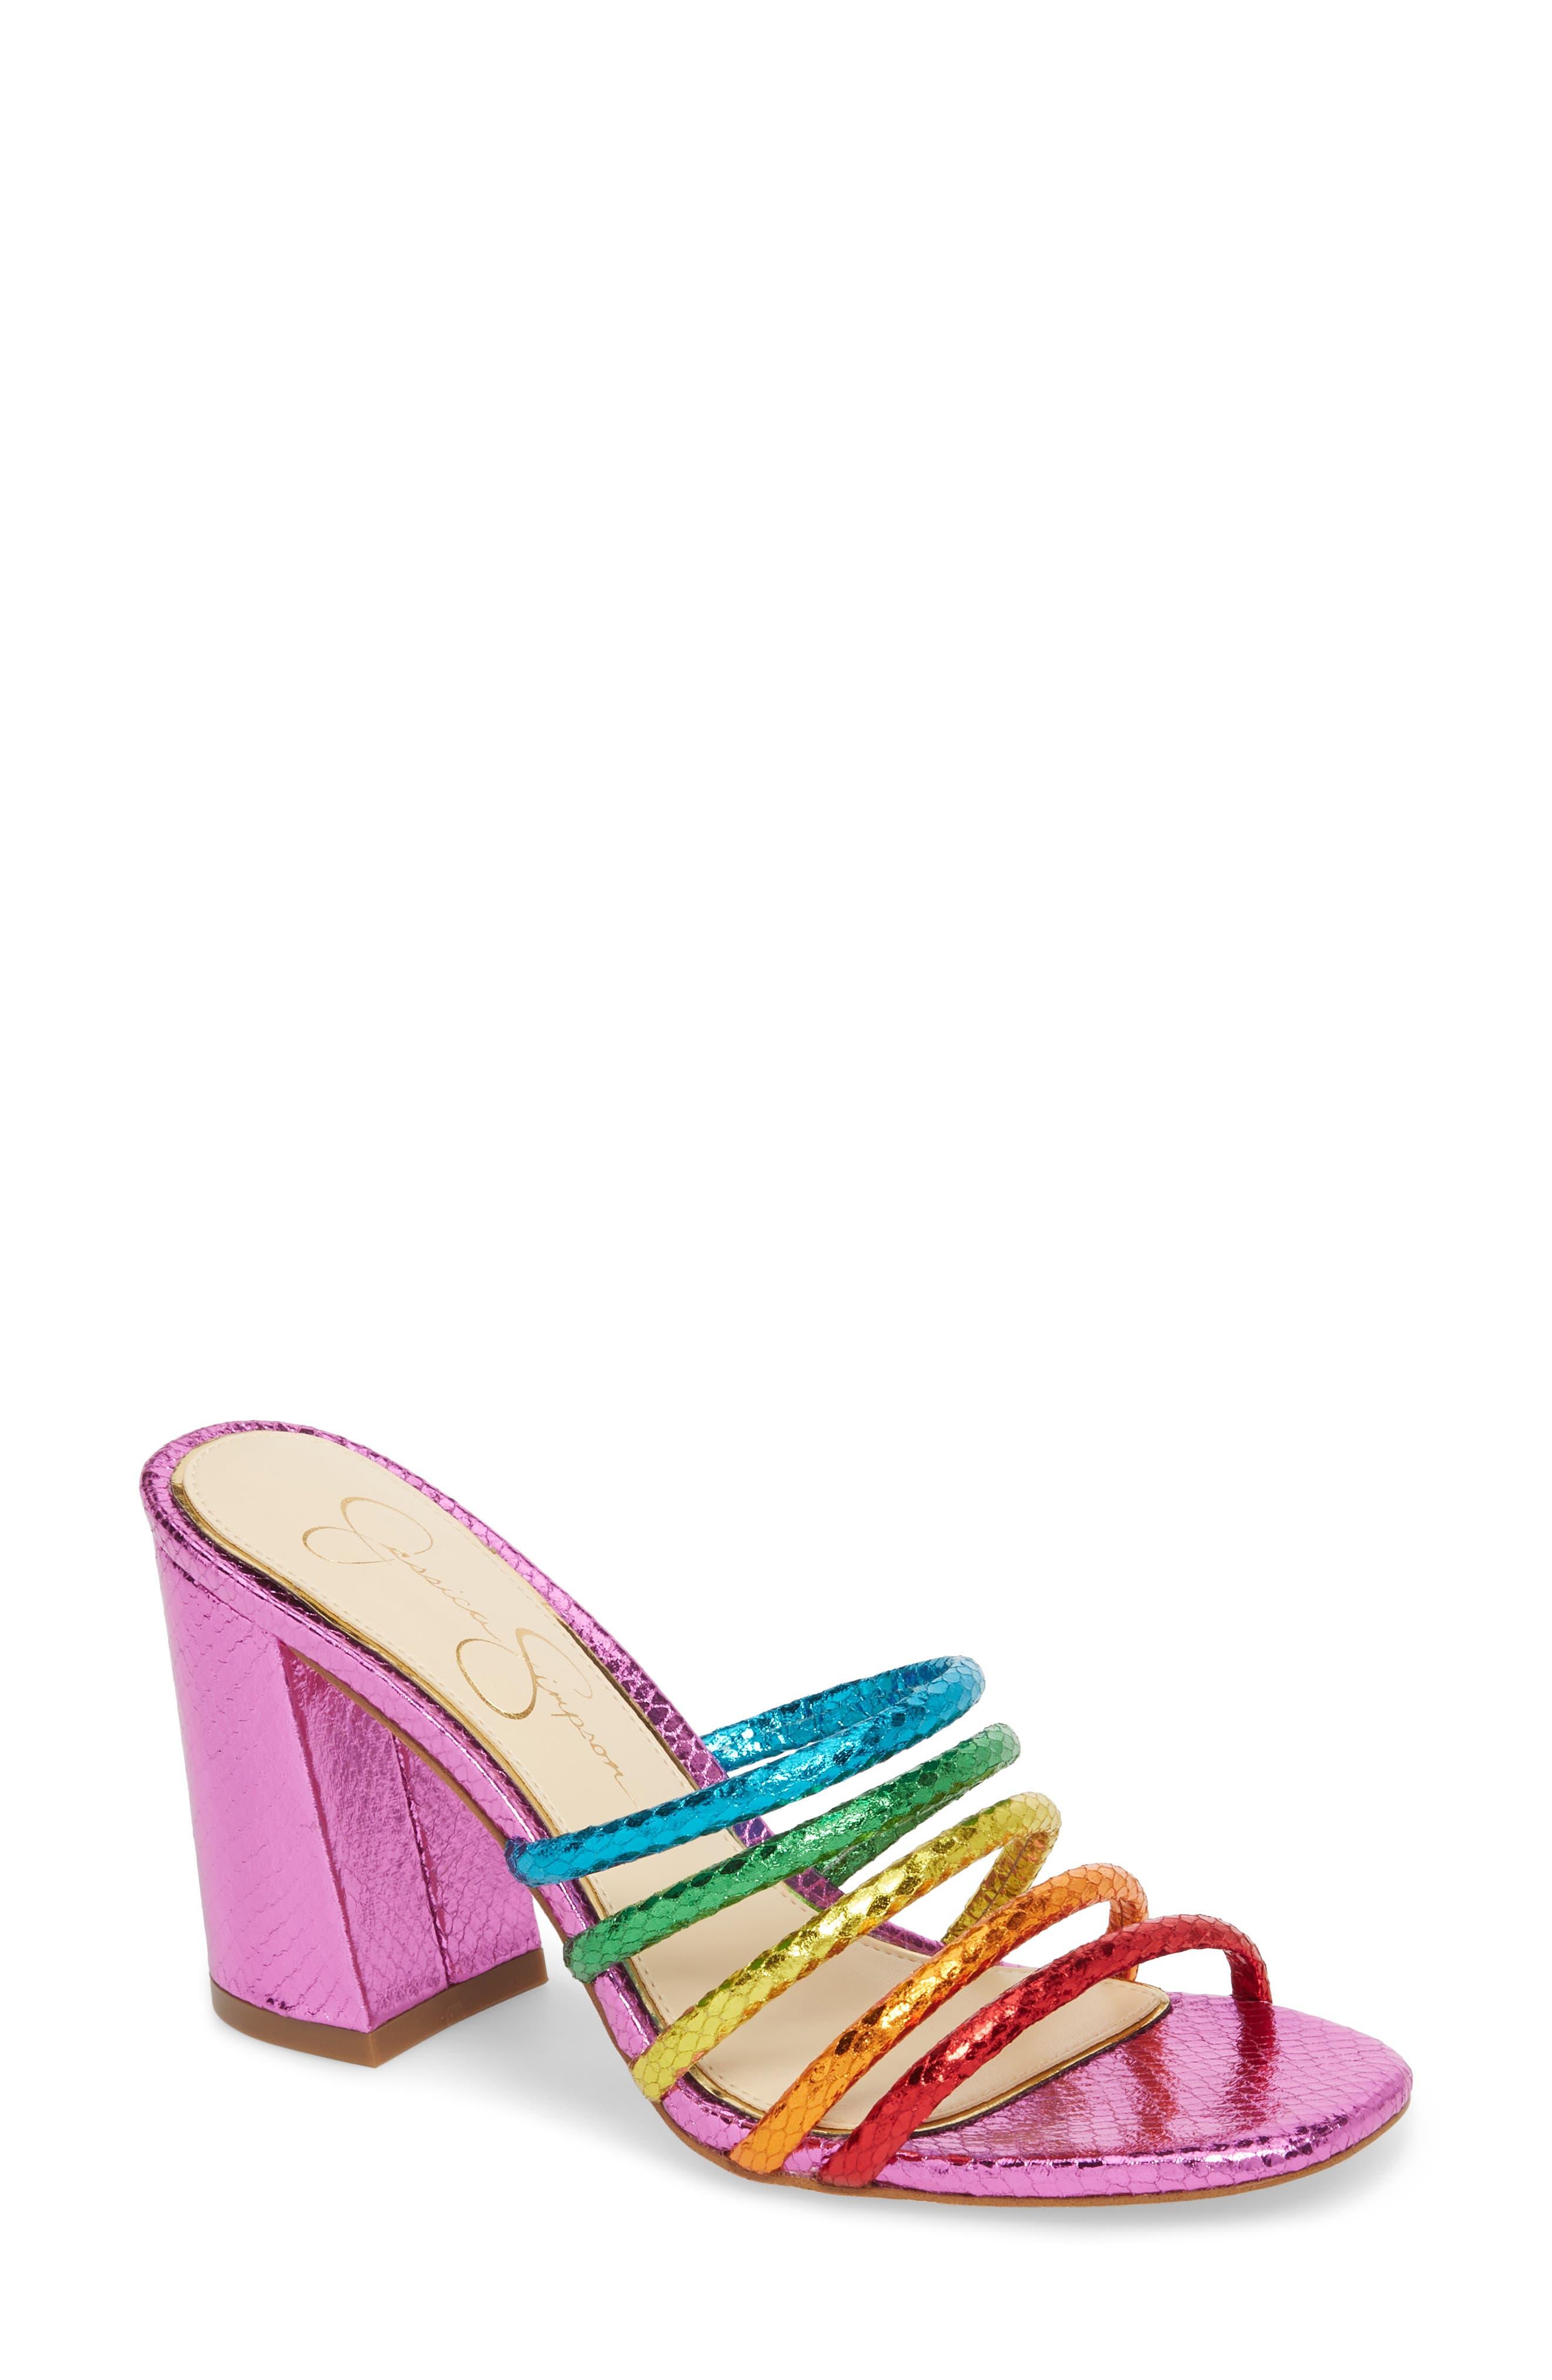 Alternate Image 1 Selected - Jessica Simpson Fixton Strappy Slide Sandal (Women)